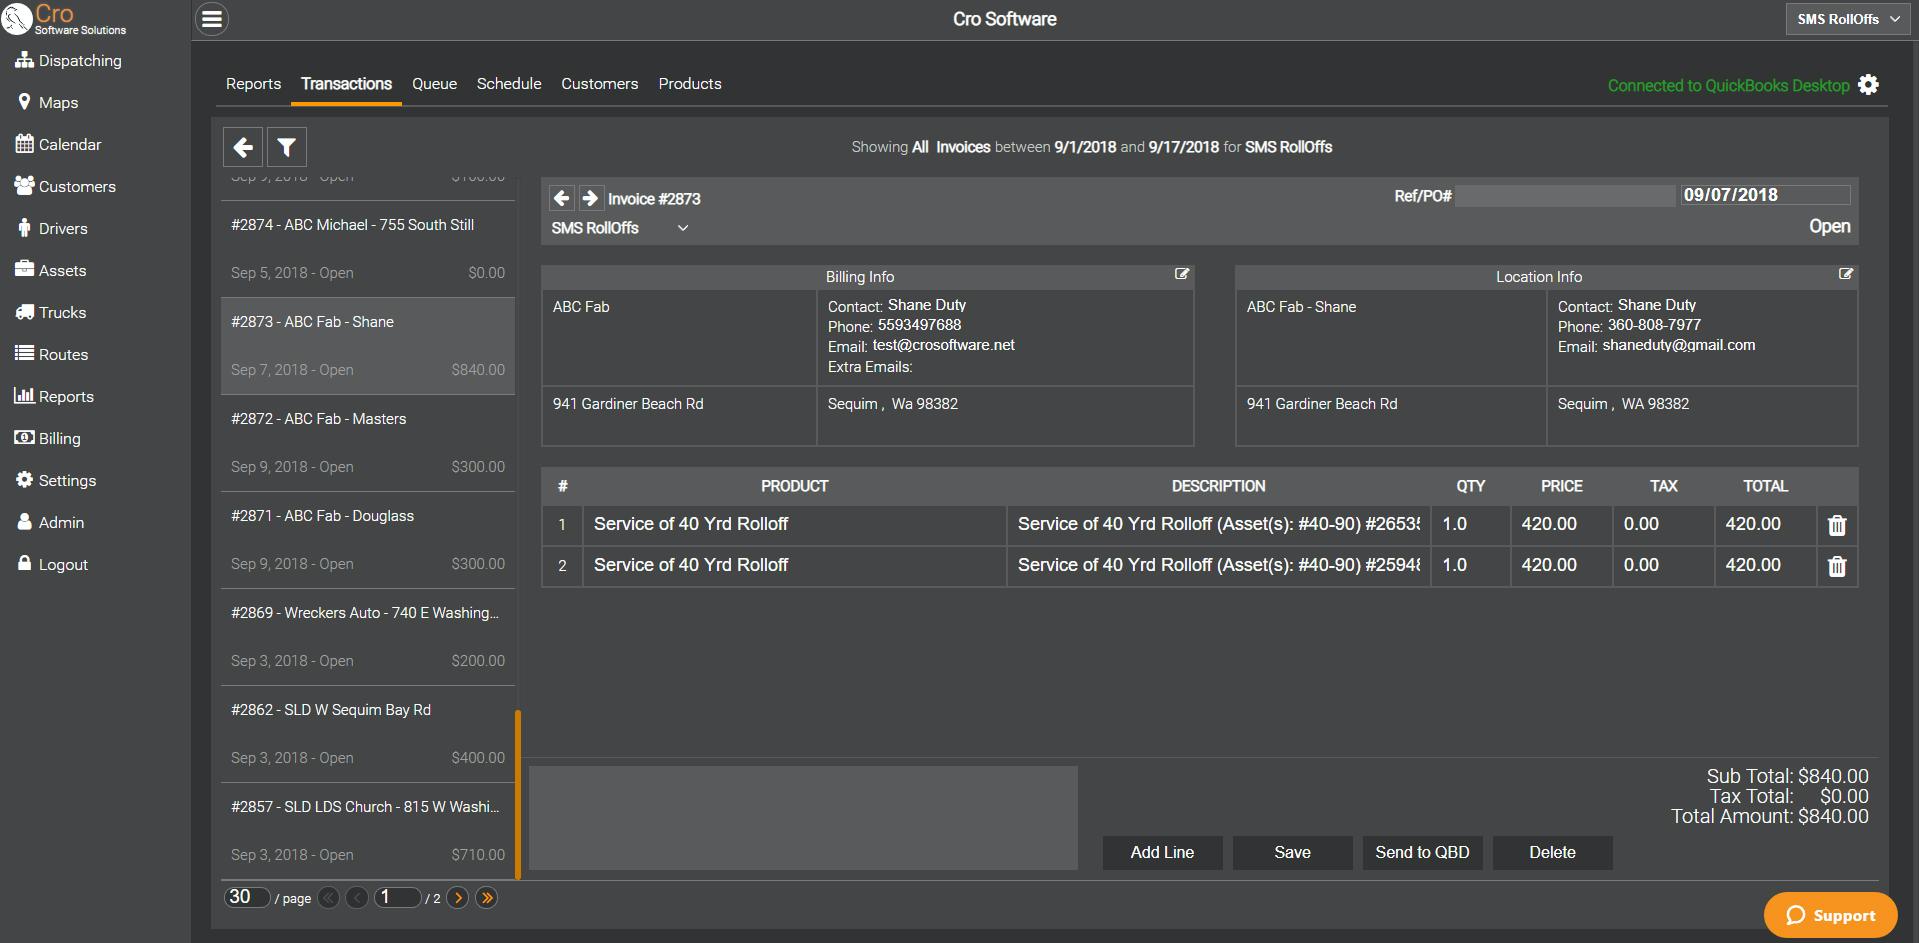 CRO Software transactions page screenshot